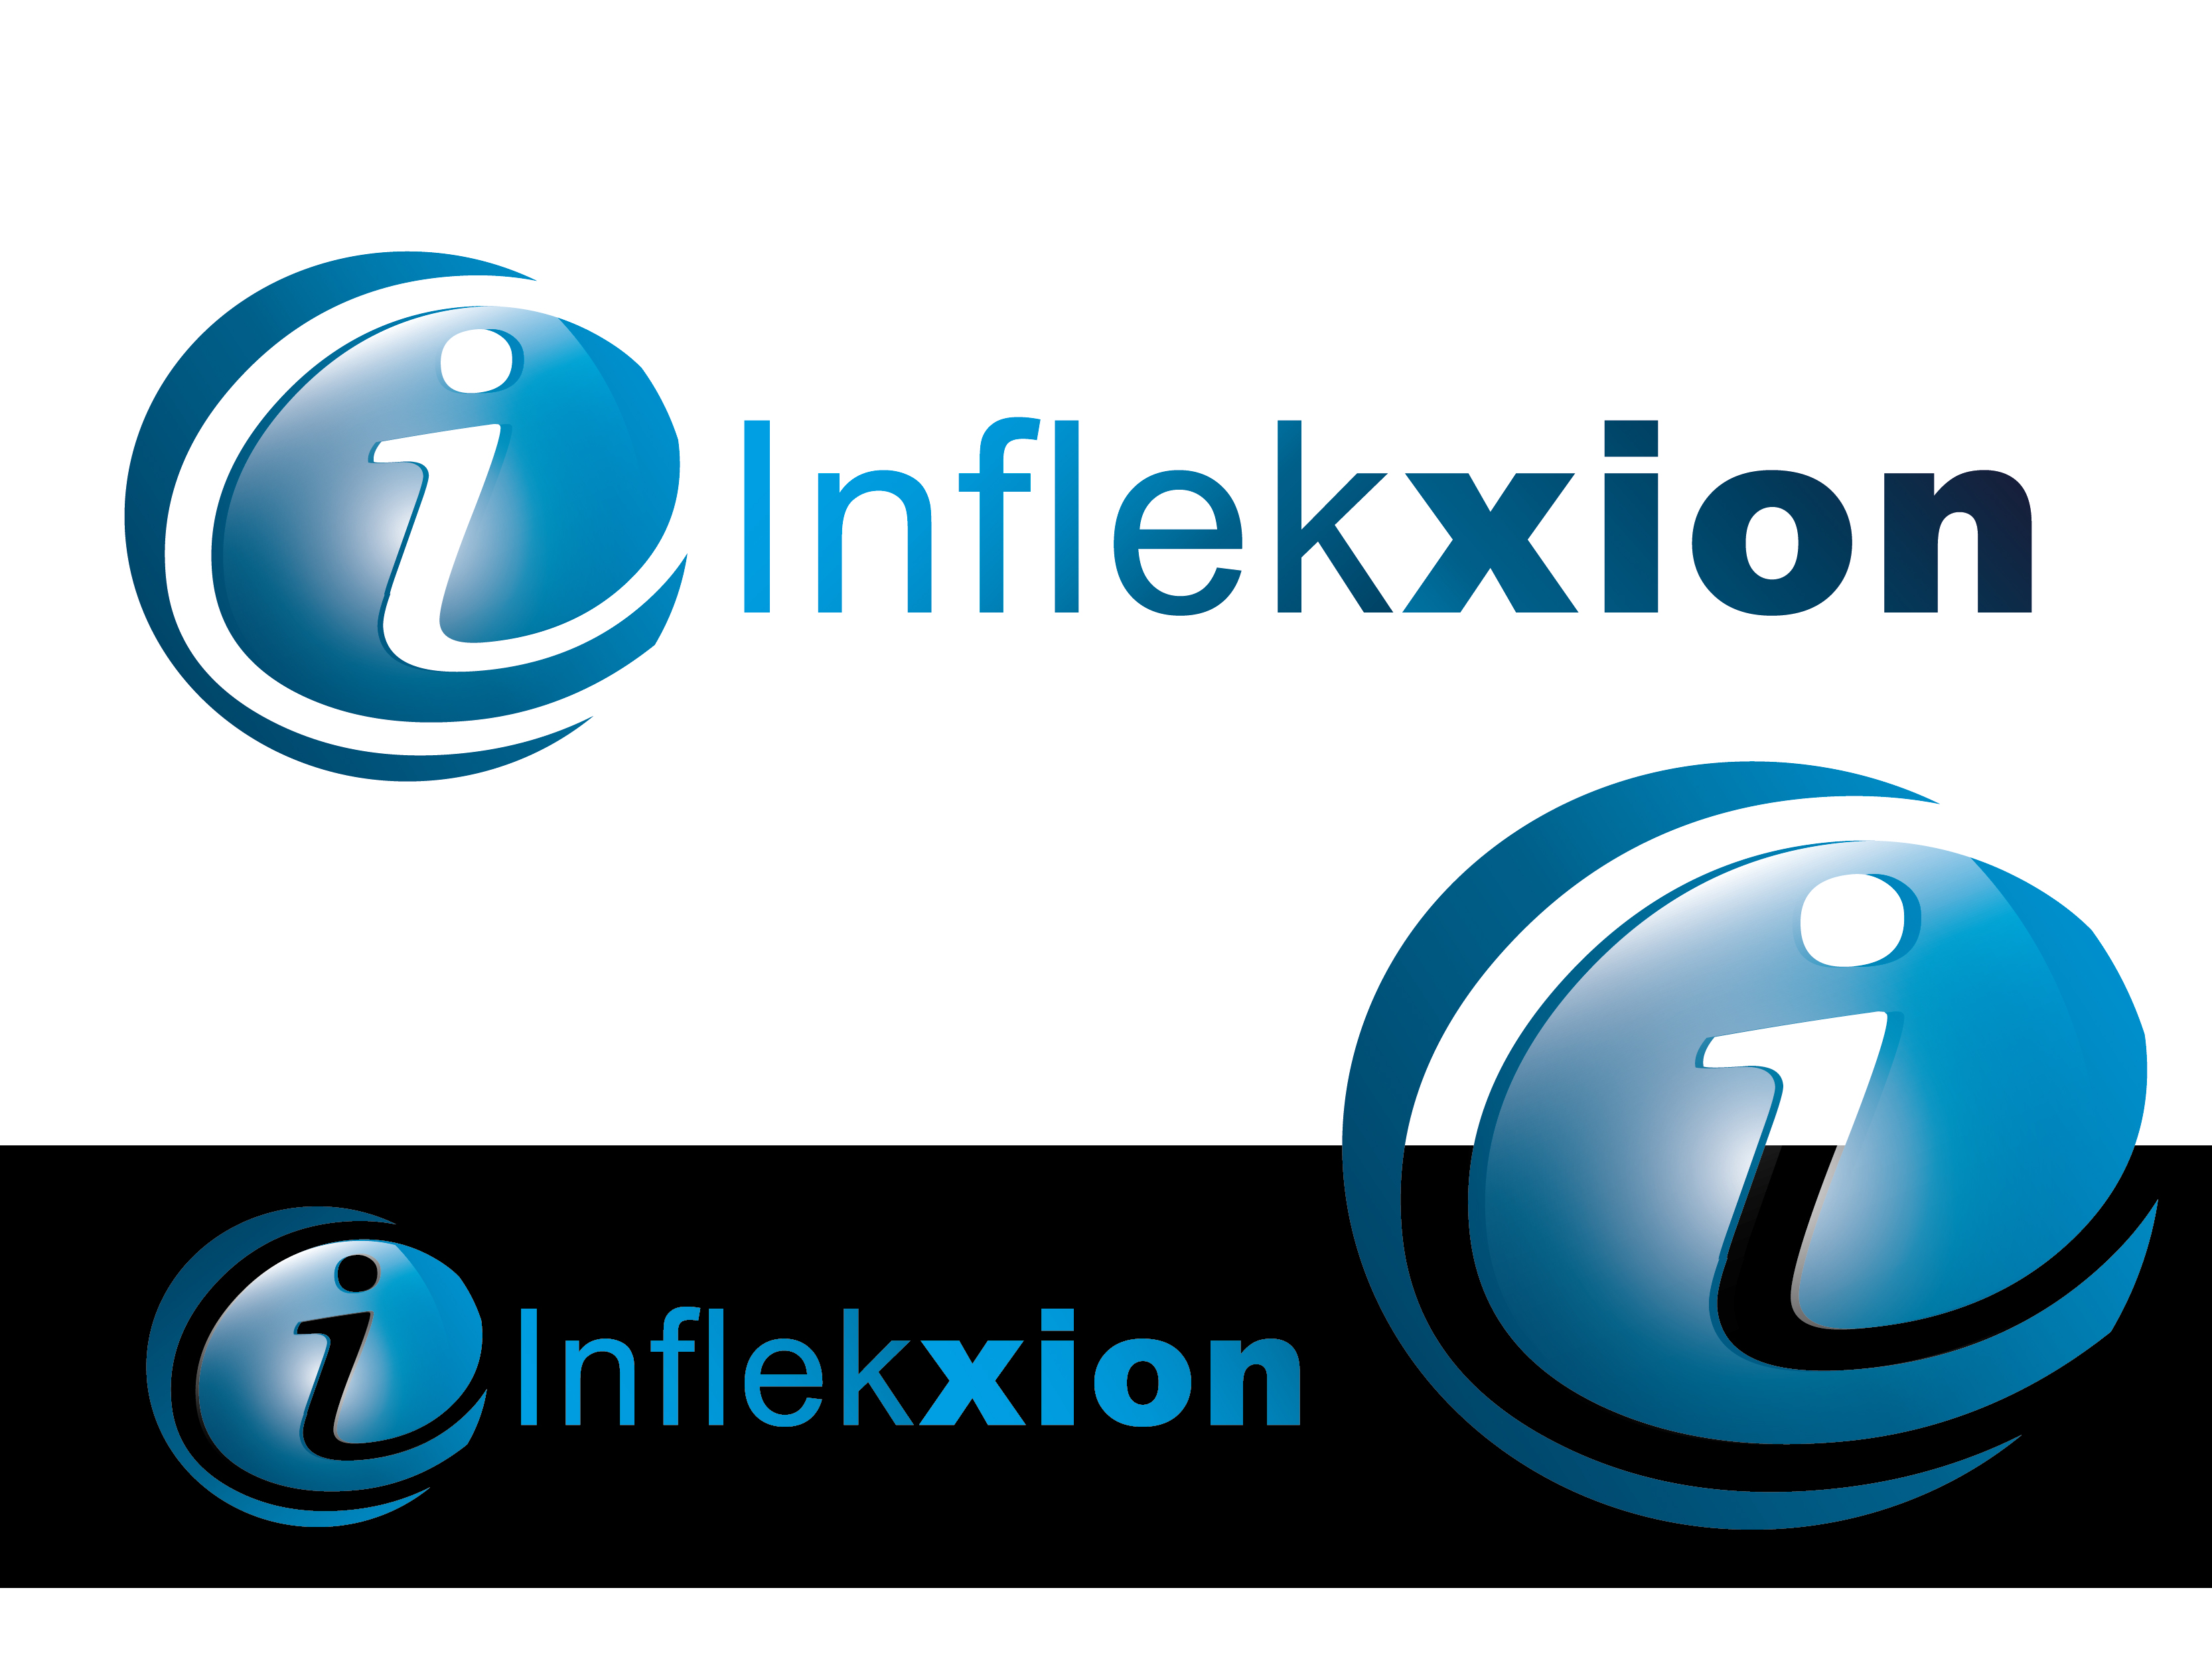 Logo Design by VENTSISLAV KOVACHEV - Entry No. 49 in the Logo Design Contest Professional Logo Design for Inflekxion.